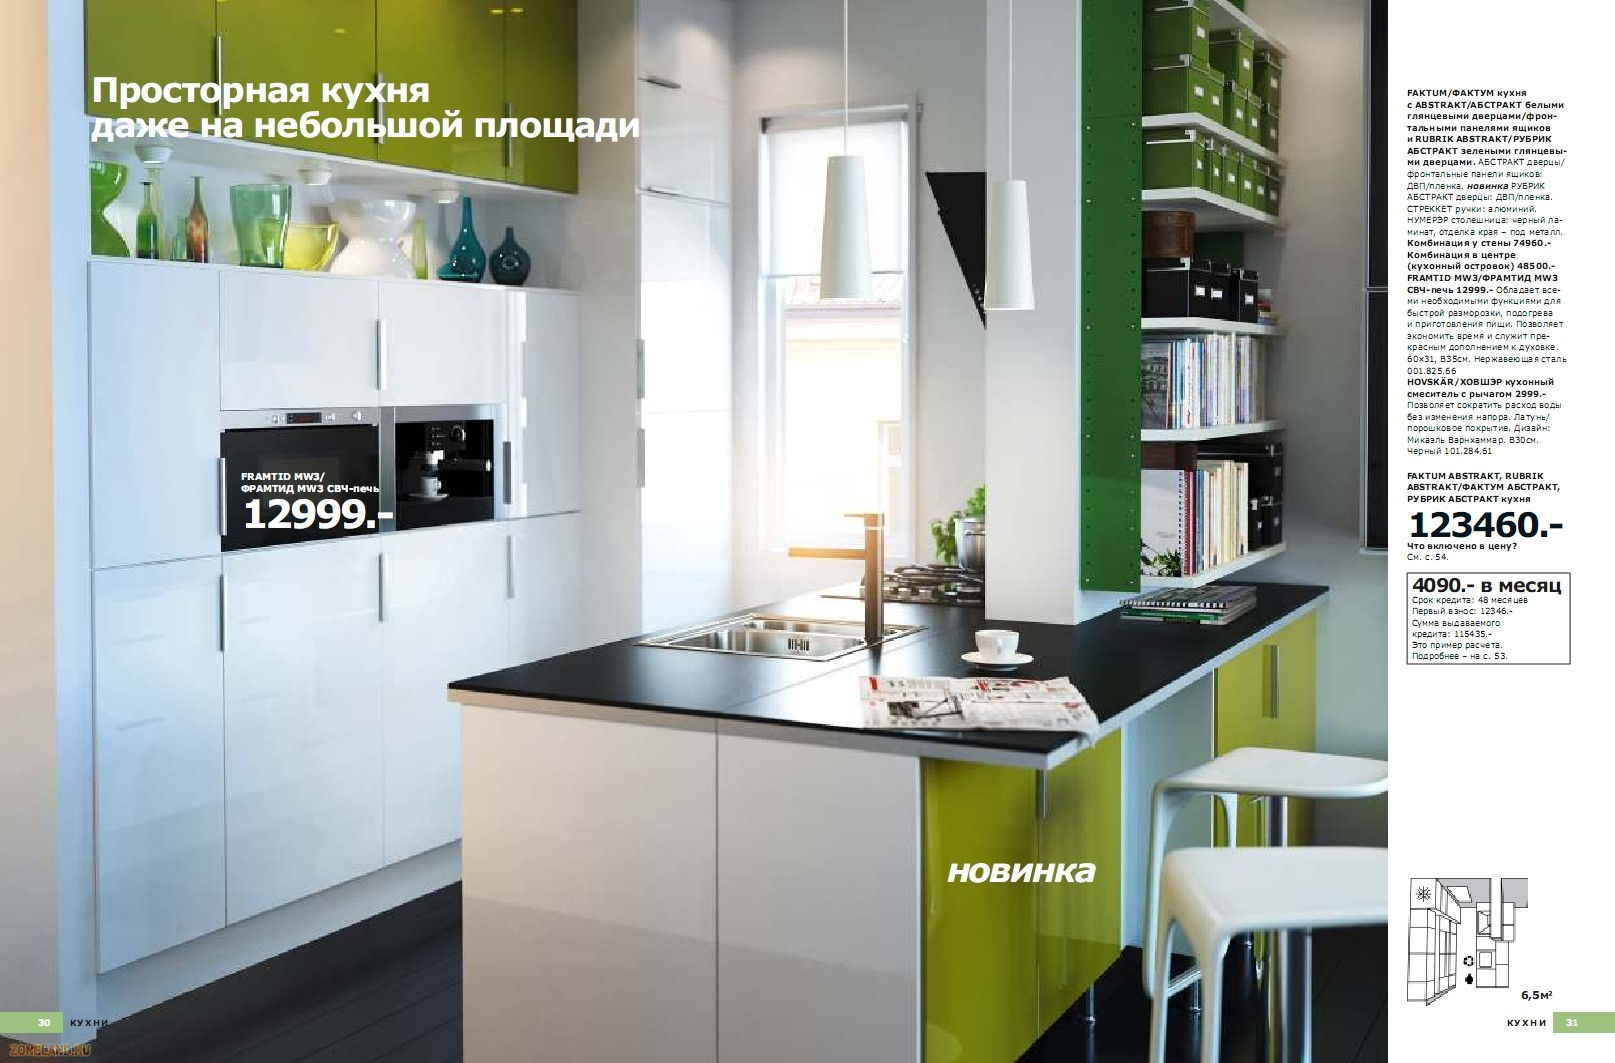 Магазин мебели икеа каталог 2012 кухни